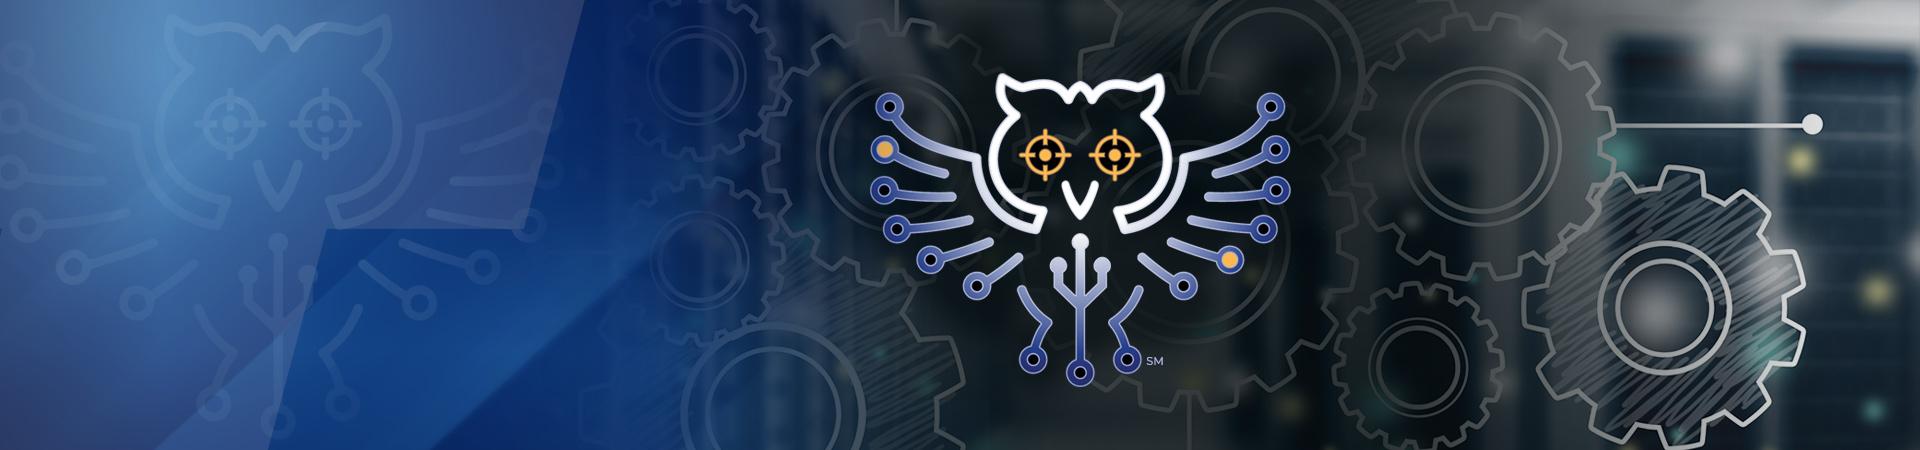 Technica Innovation owl on lab background